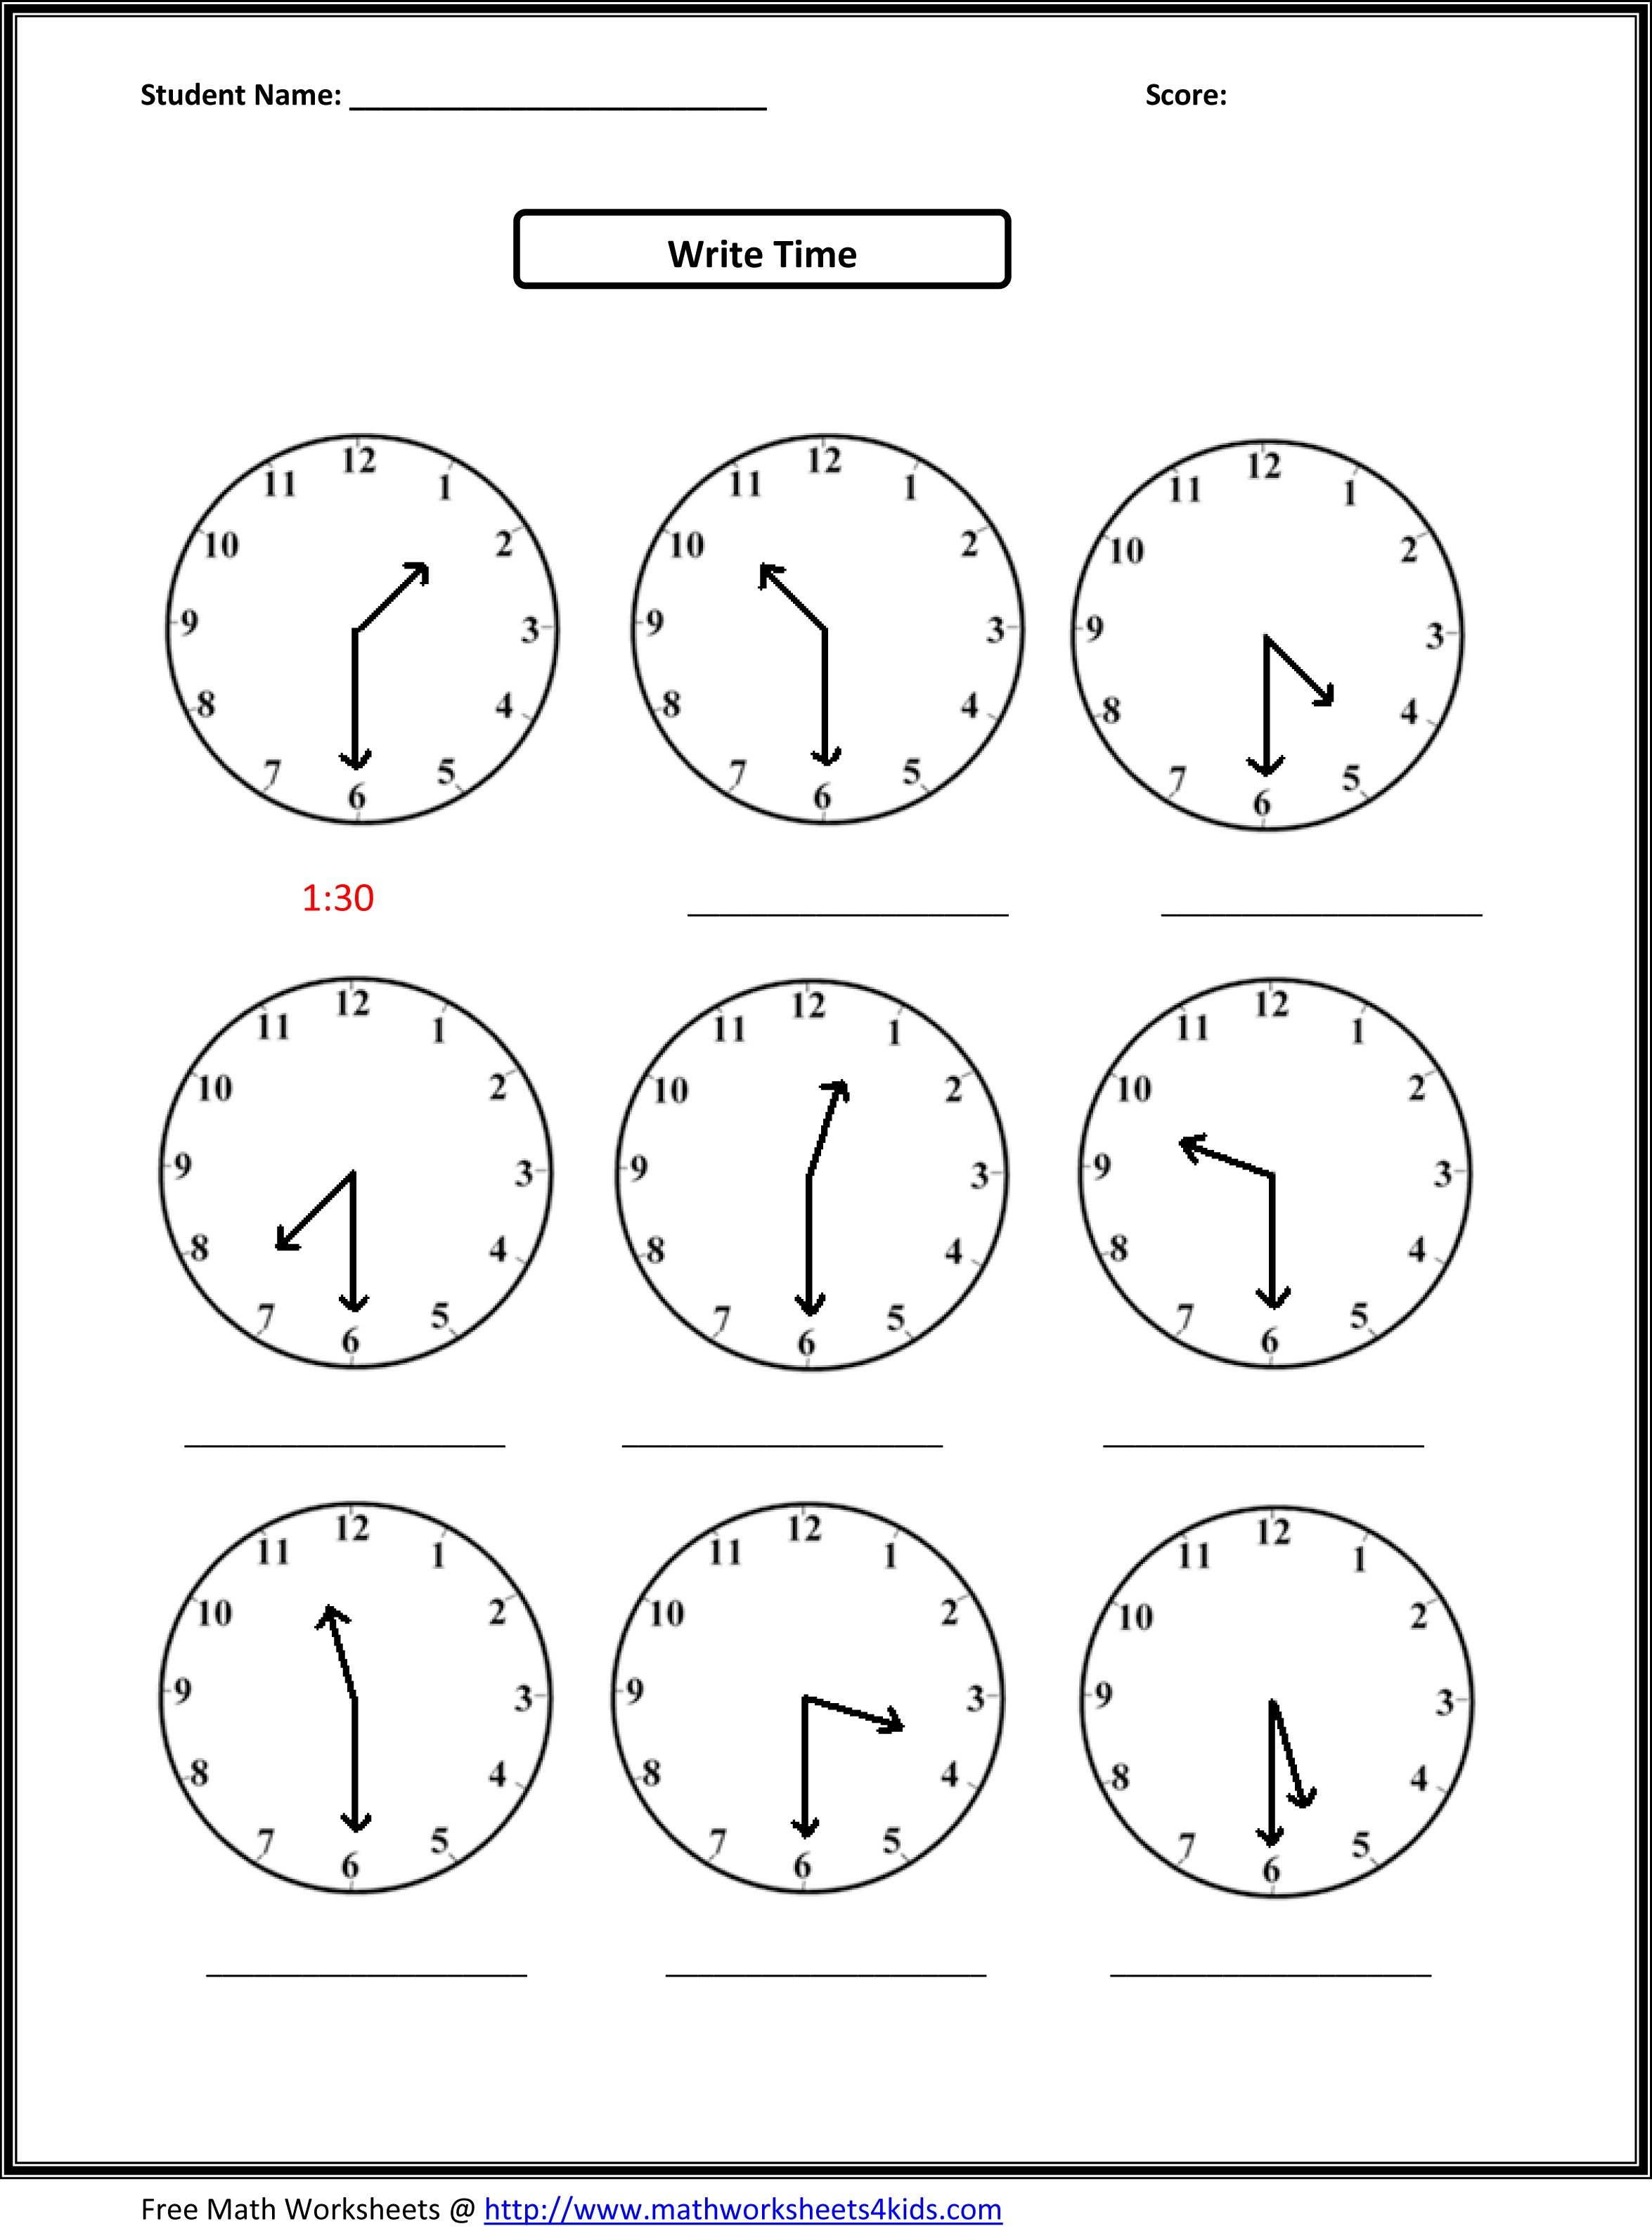 2Nd Grade Free Worksheets Math   Math: Time/measurement   2Nd Grade   Free Printable Second Grade Worksheets